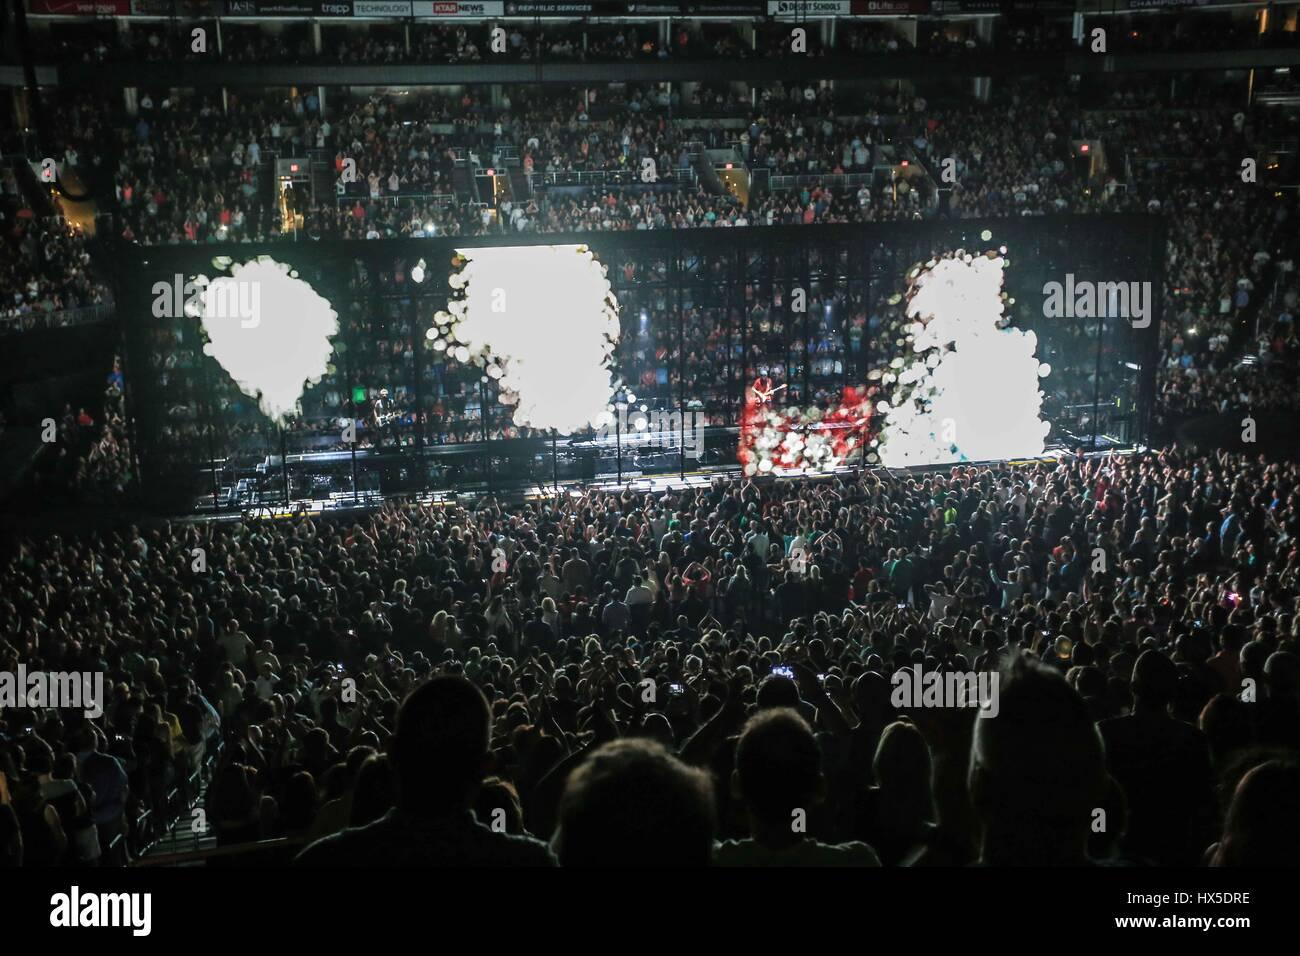 rock band U2 during world tour in the Airways Center in Phoenix